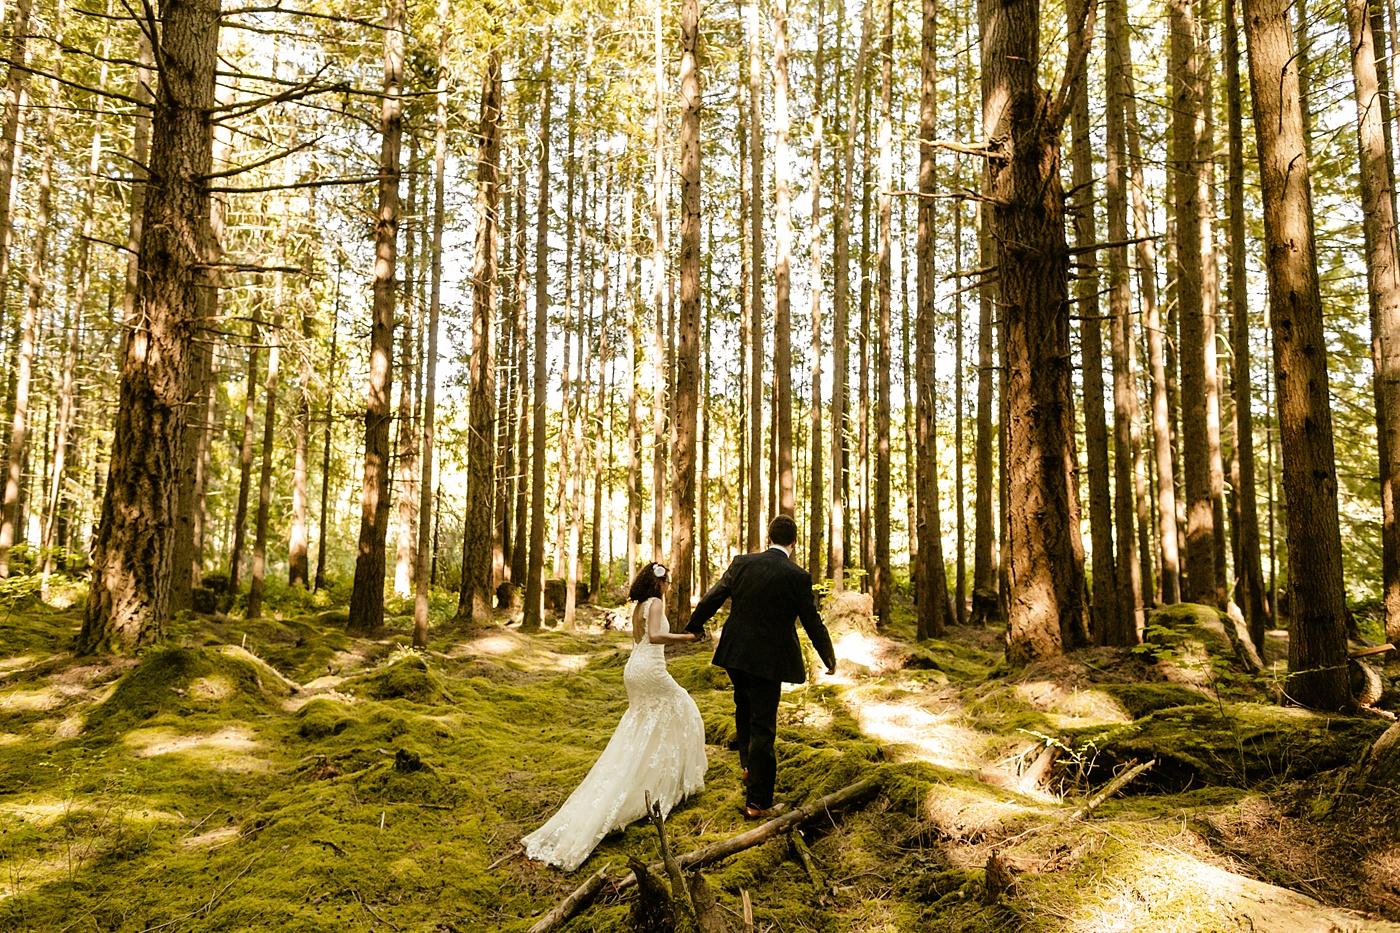 top wedding photographer in seattle washington, award winning photographer